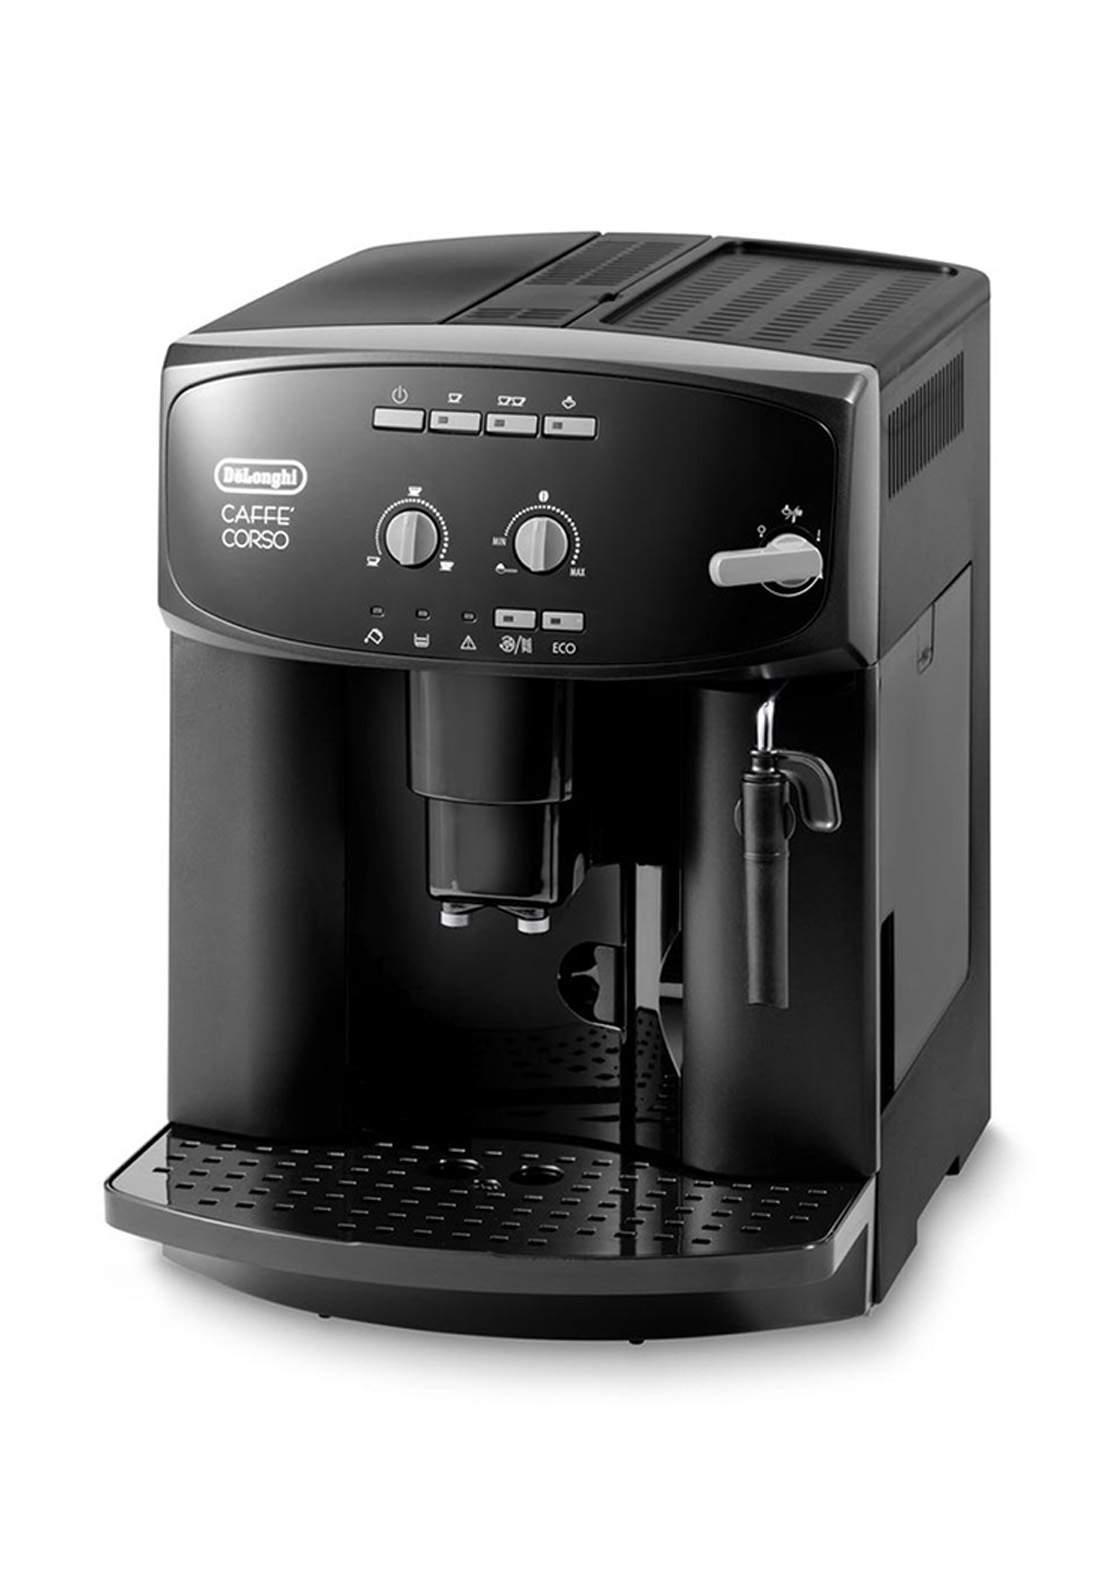 Delonghi Coffee Machine 2600 Watt ماكنة صنع قهوة